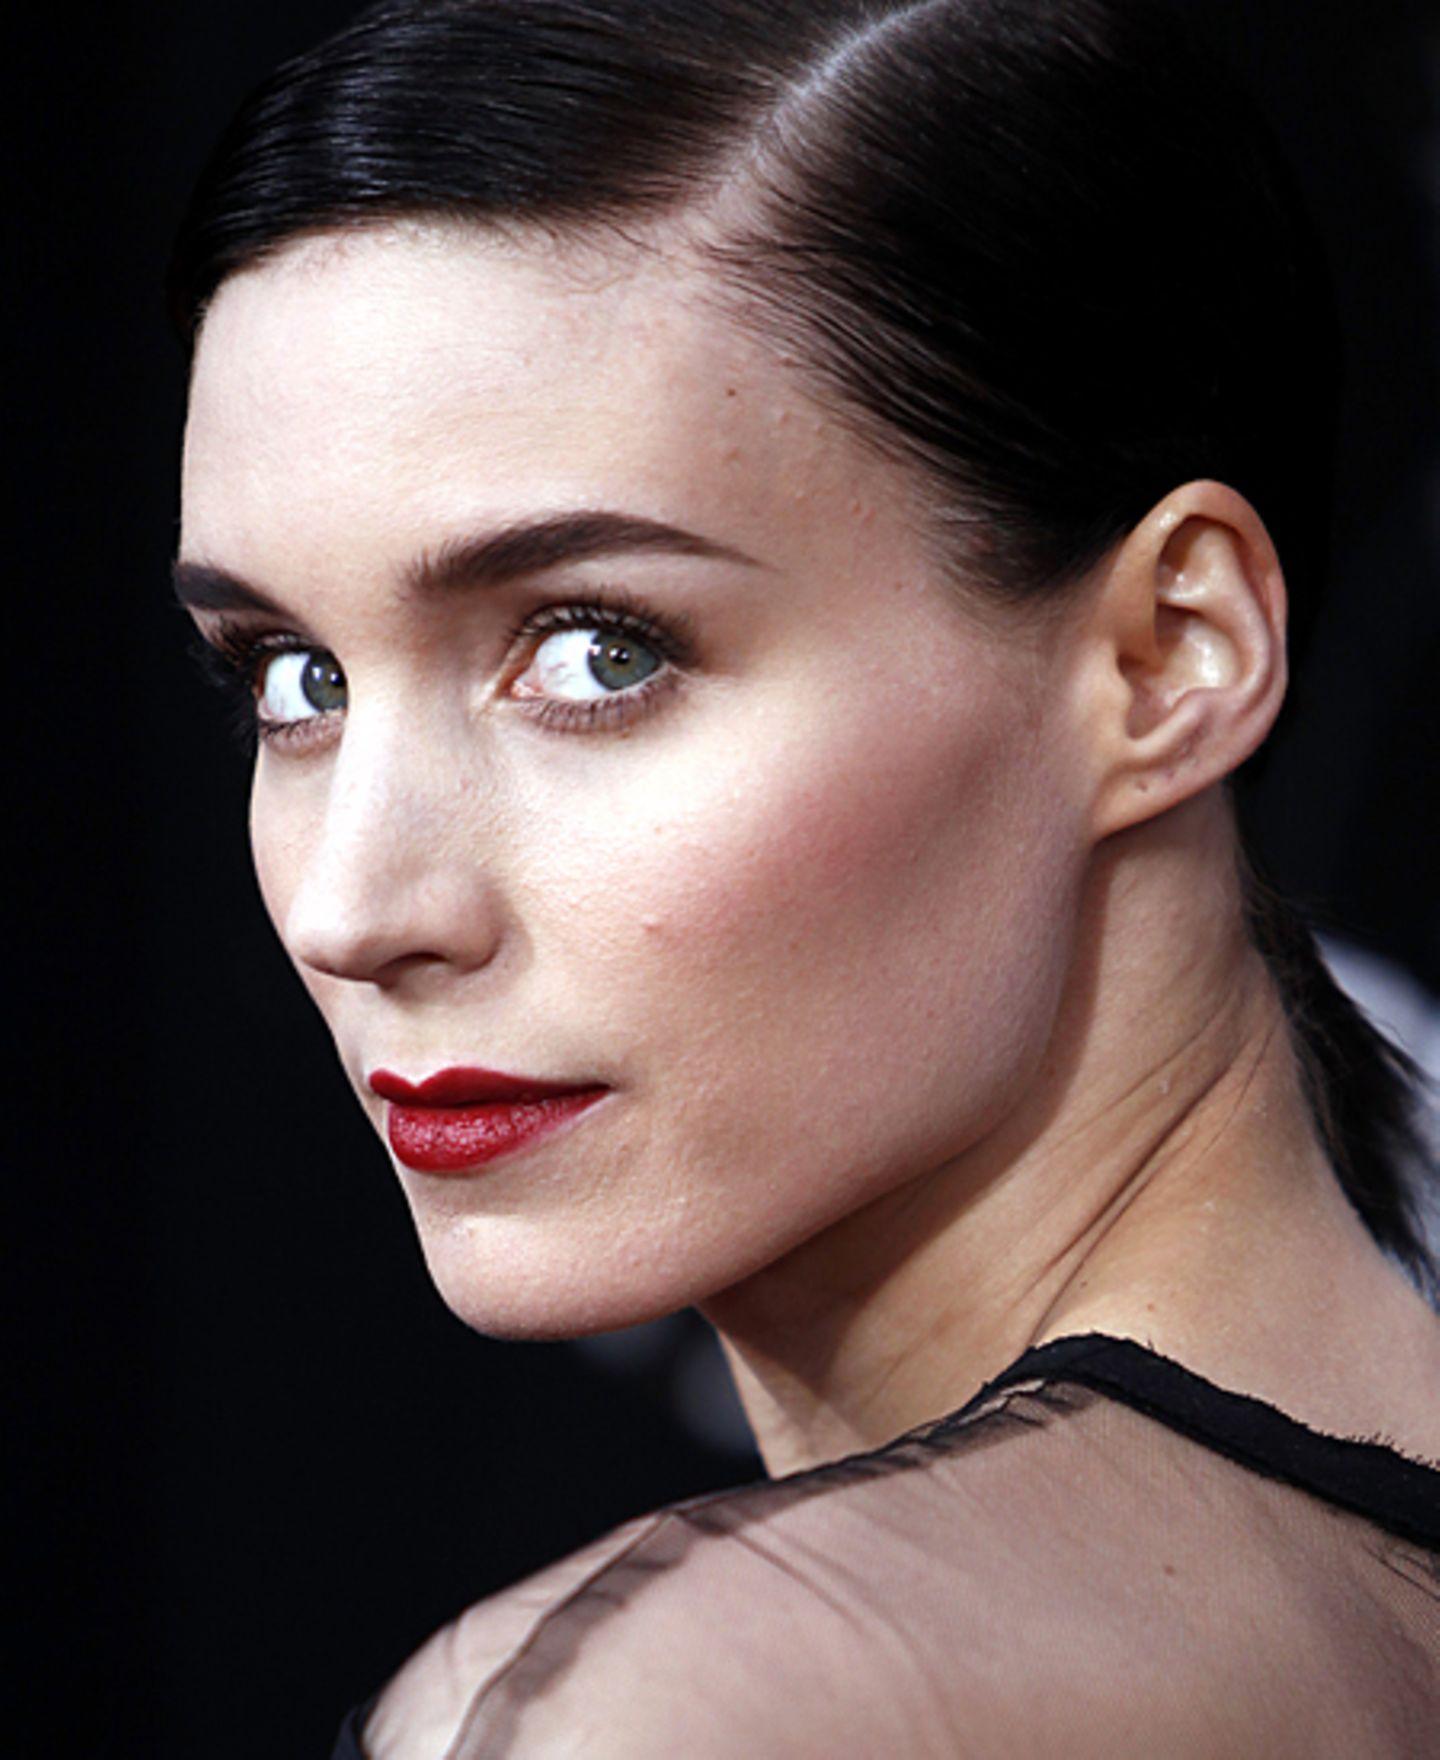 Schwarze Kleidung, schwarze Haare, blass geschminkt und dann rote Lippen: Geheimnisvoller als Rooney Mara kann man einen Look ka